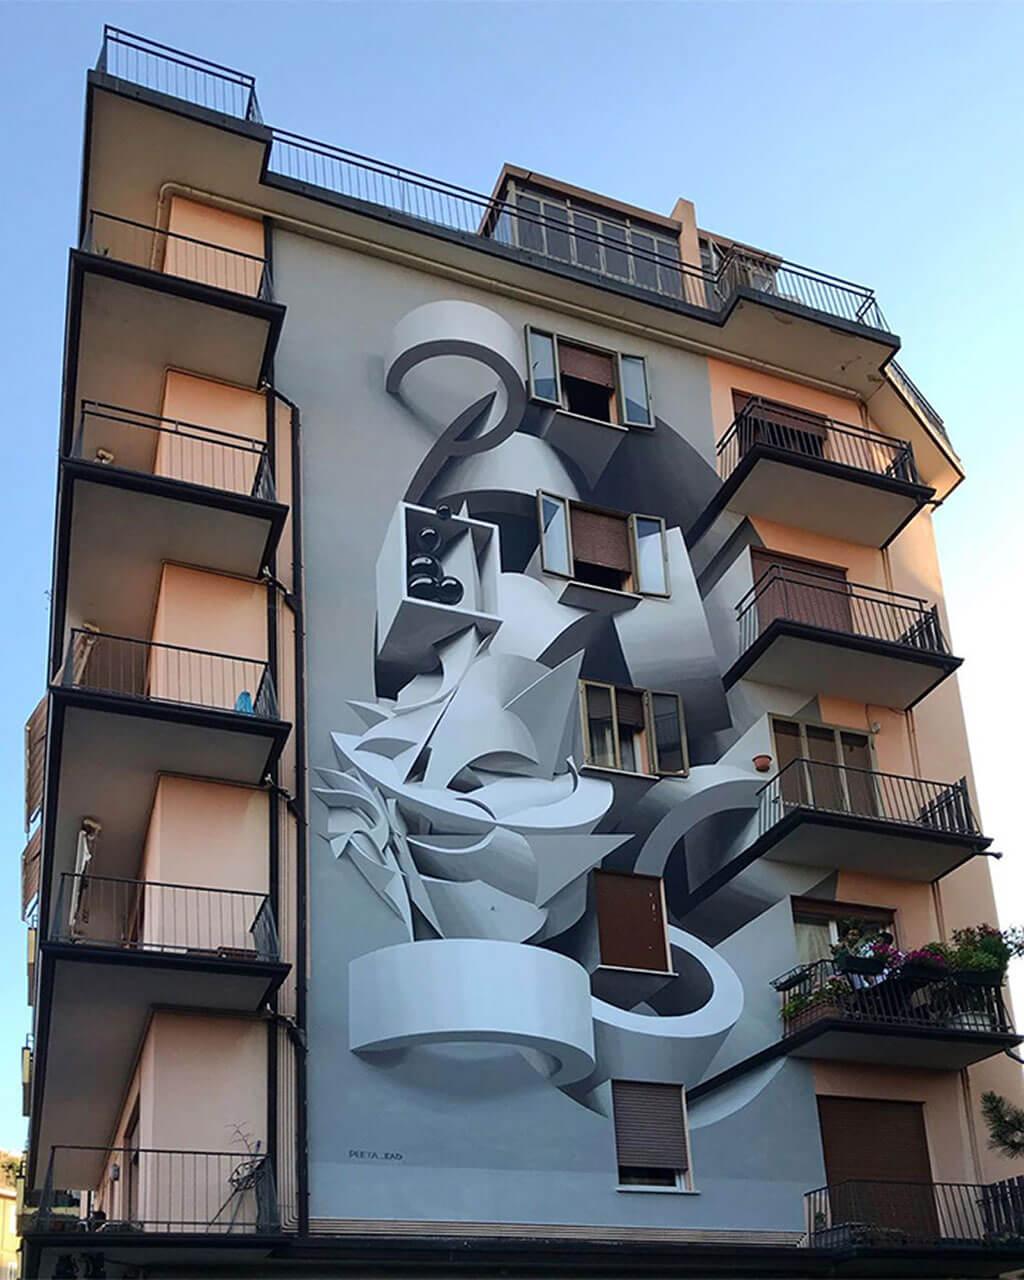 Optical illusion building art by Peeta